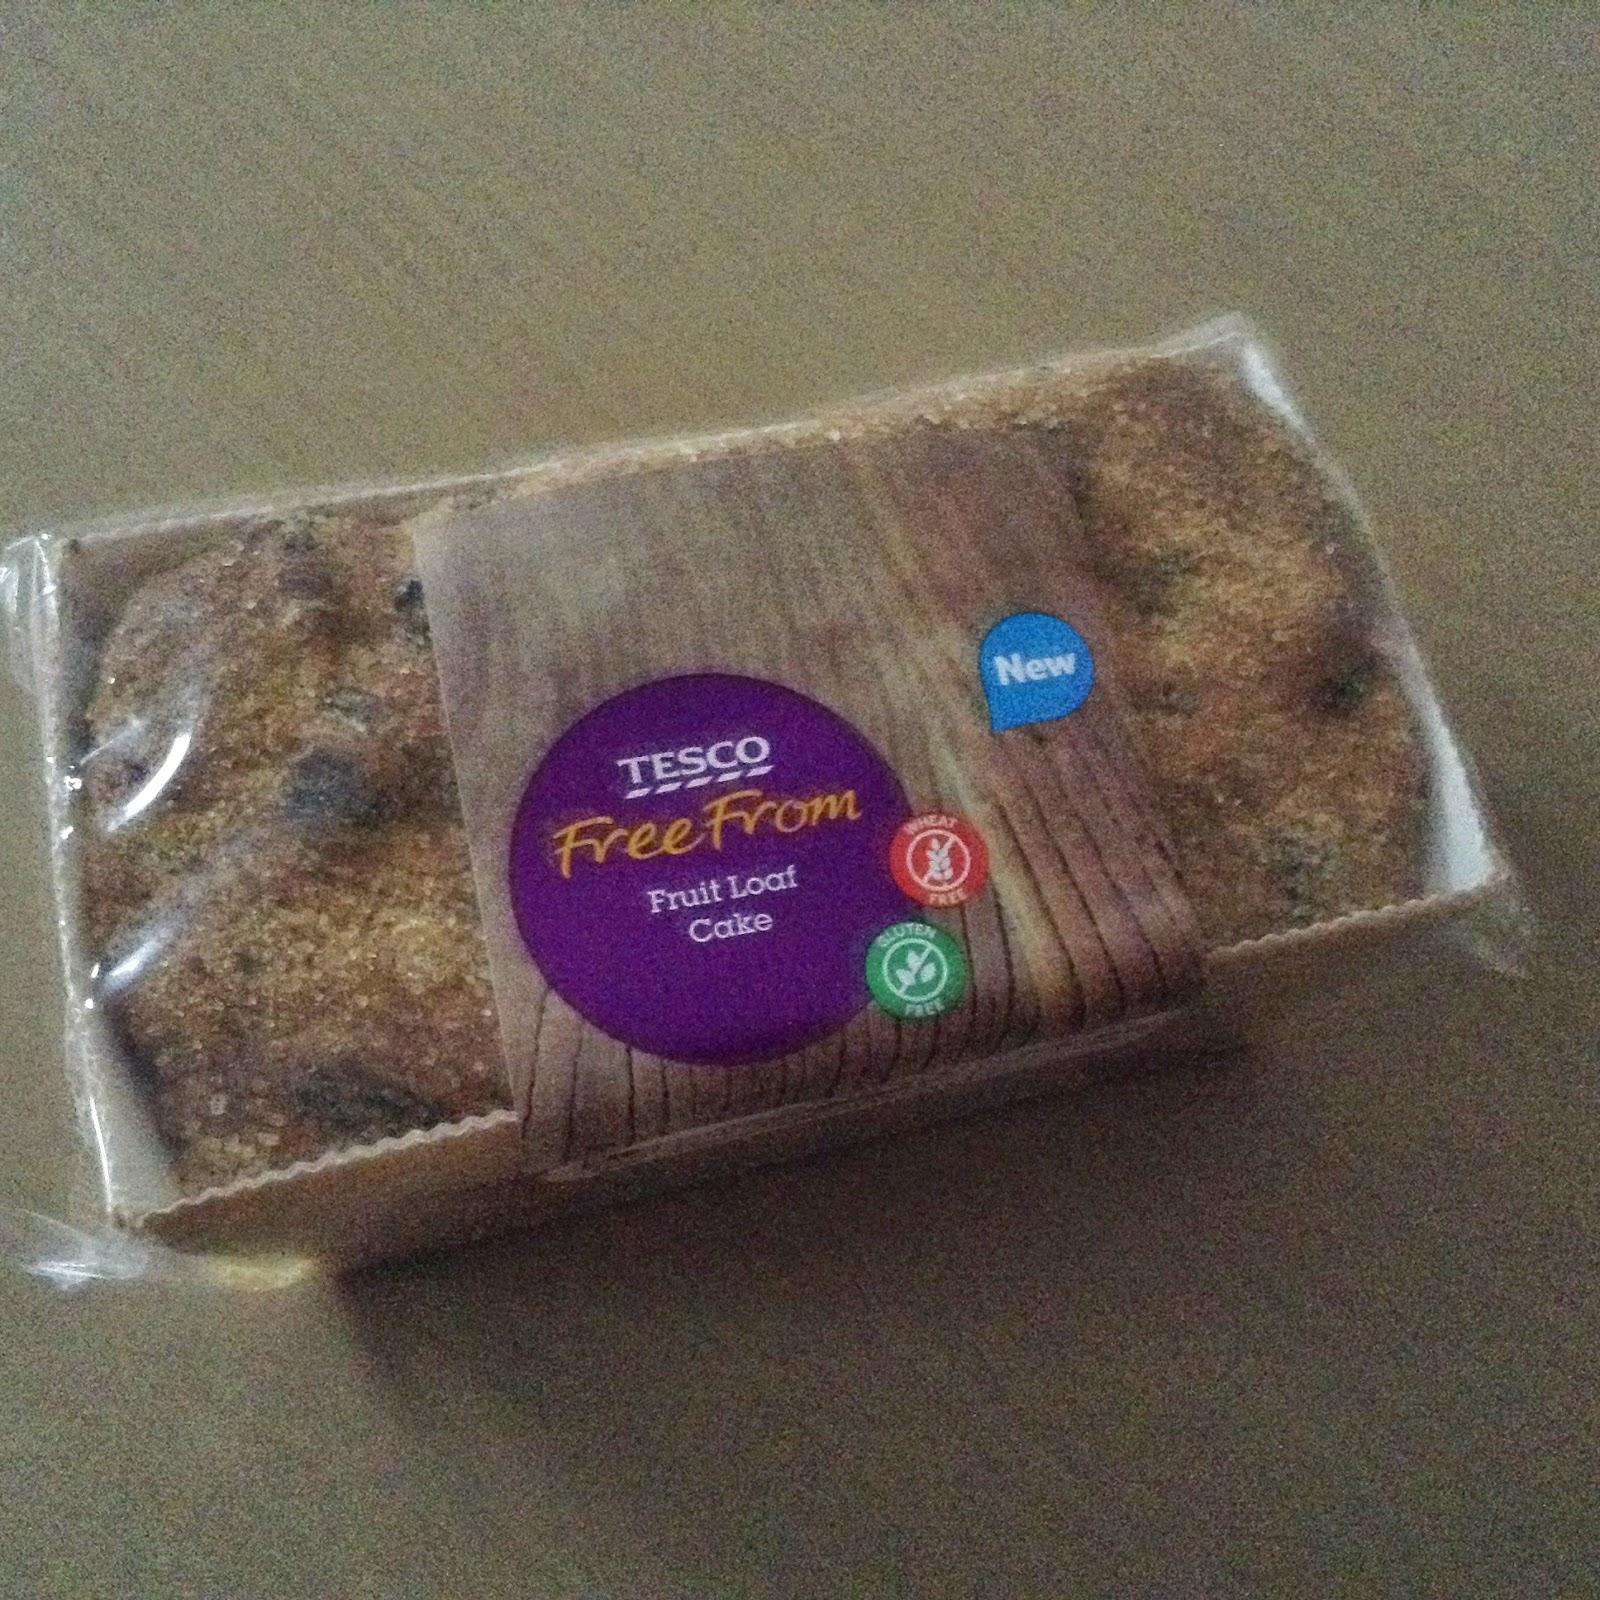 Tesco Free From Fruit Loaf Cake